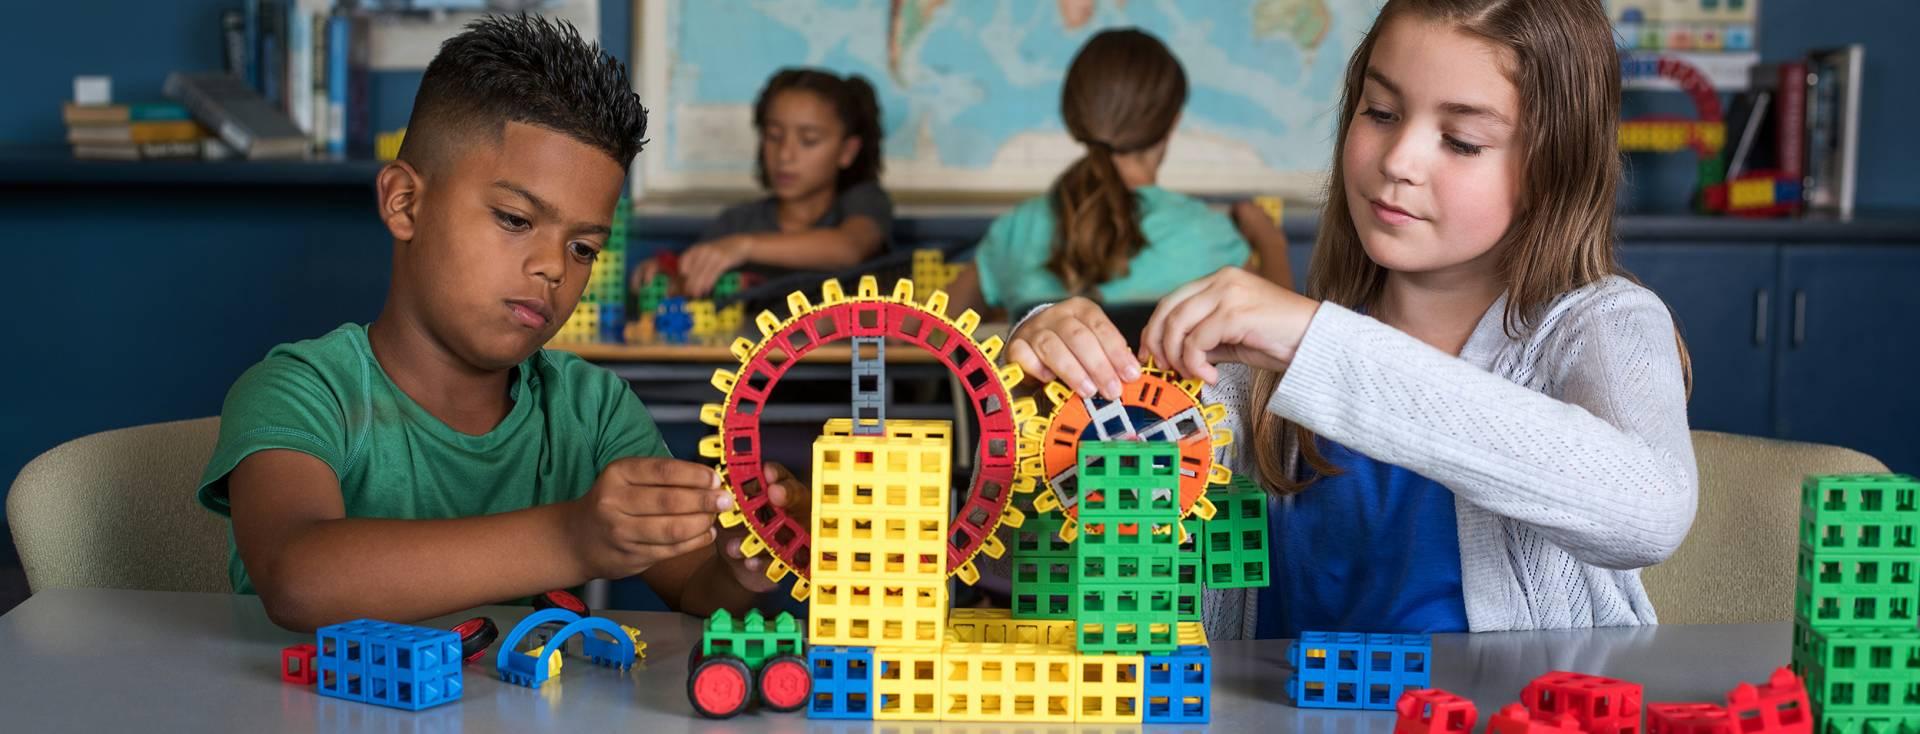 stem-education-middle-elementary-school-program-girl-boy-blocks-fun.jpg